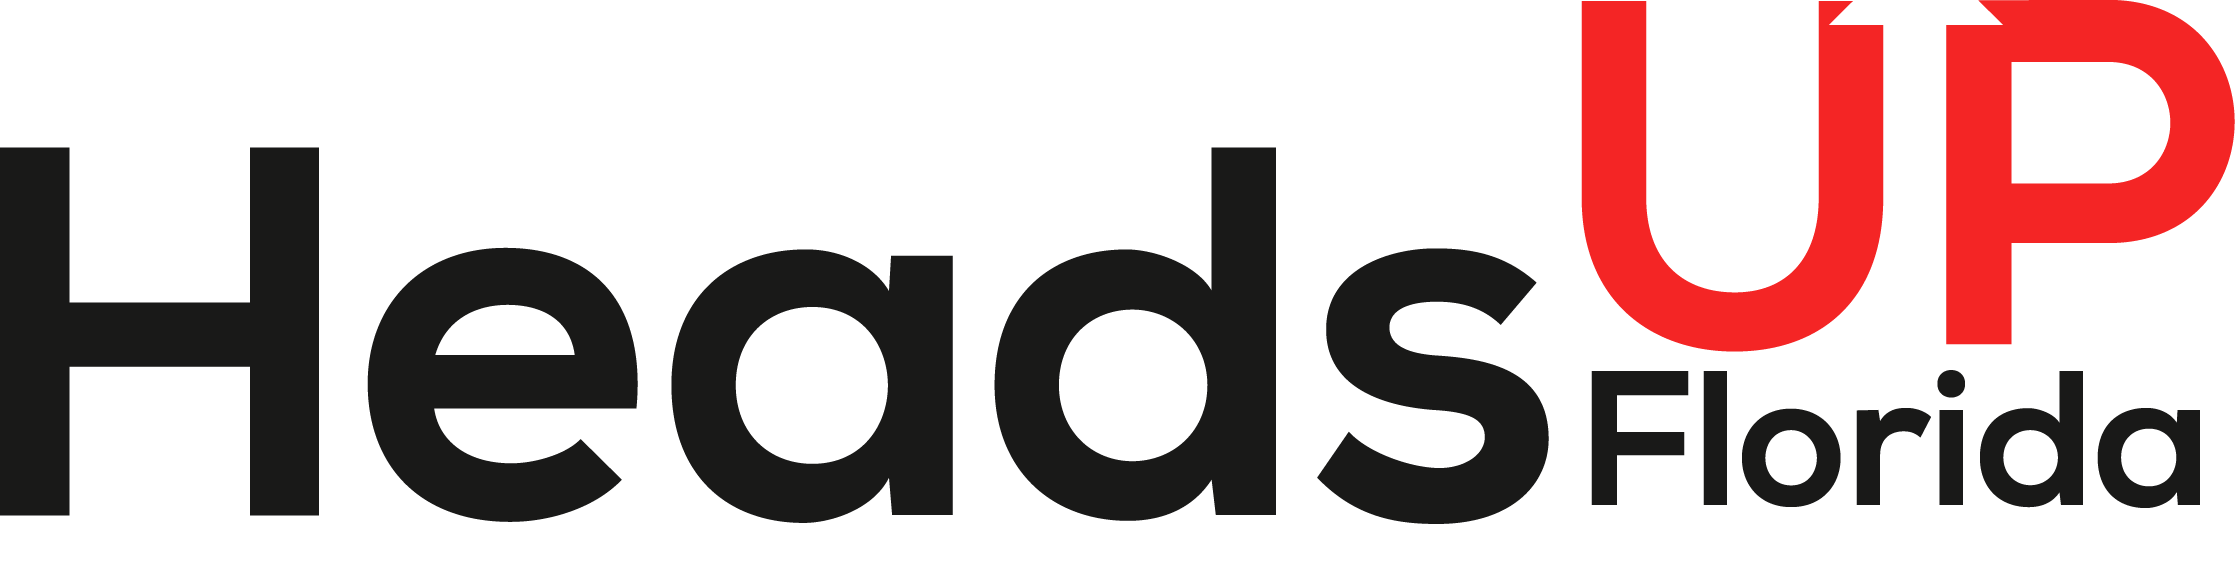 HeadsUpFl_Logo.png